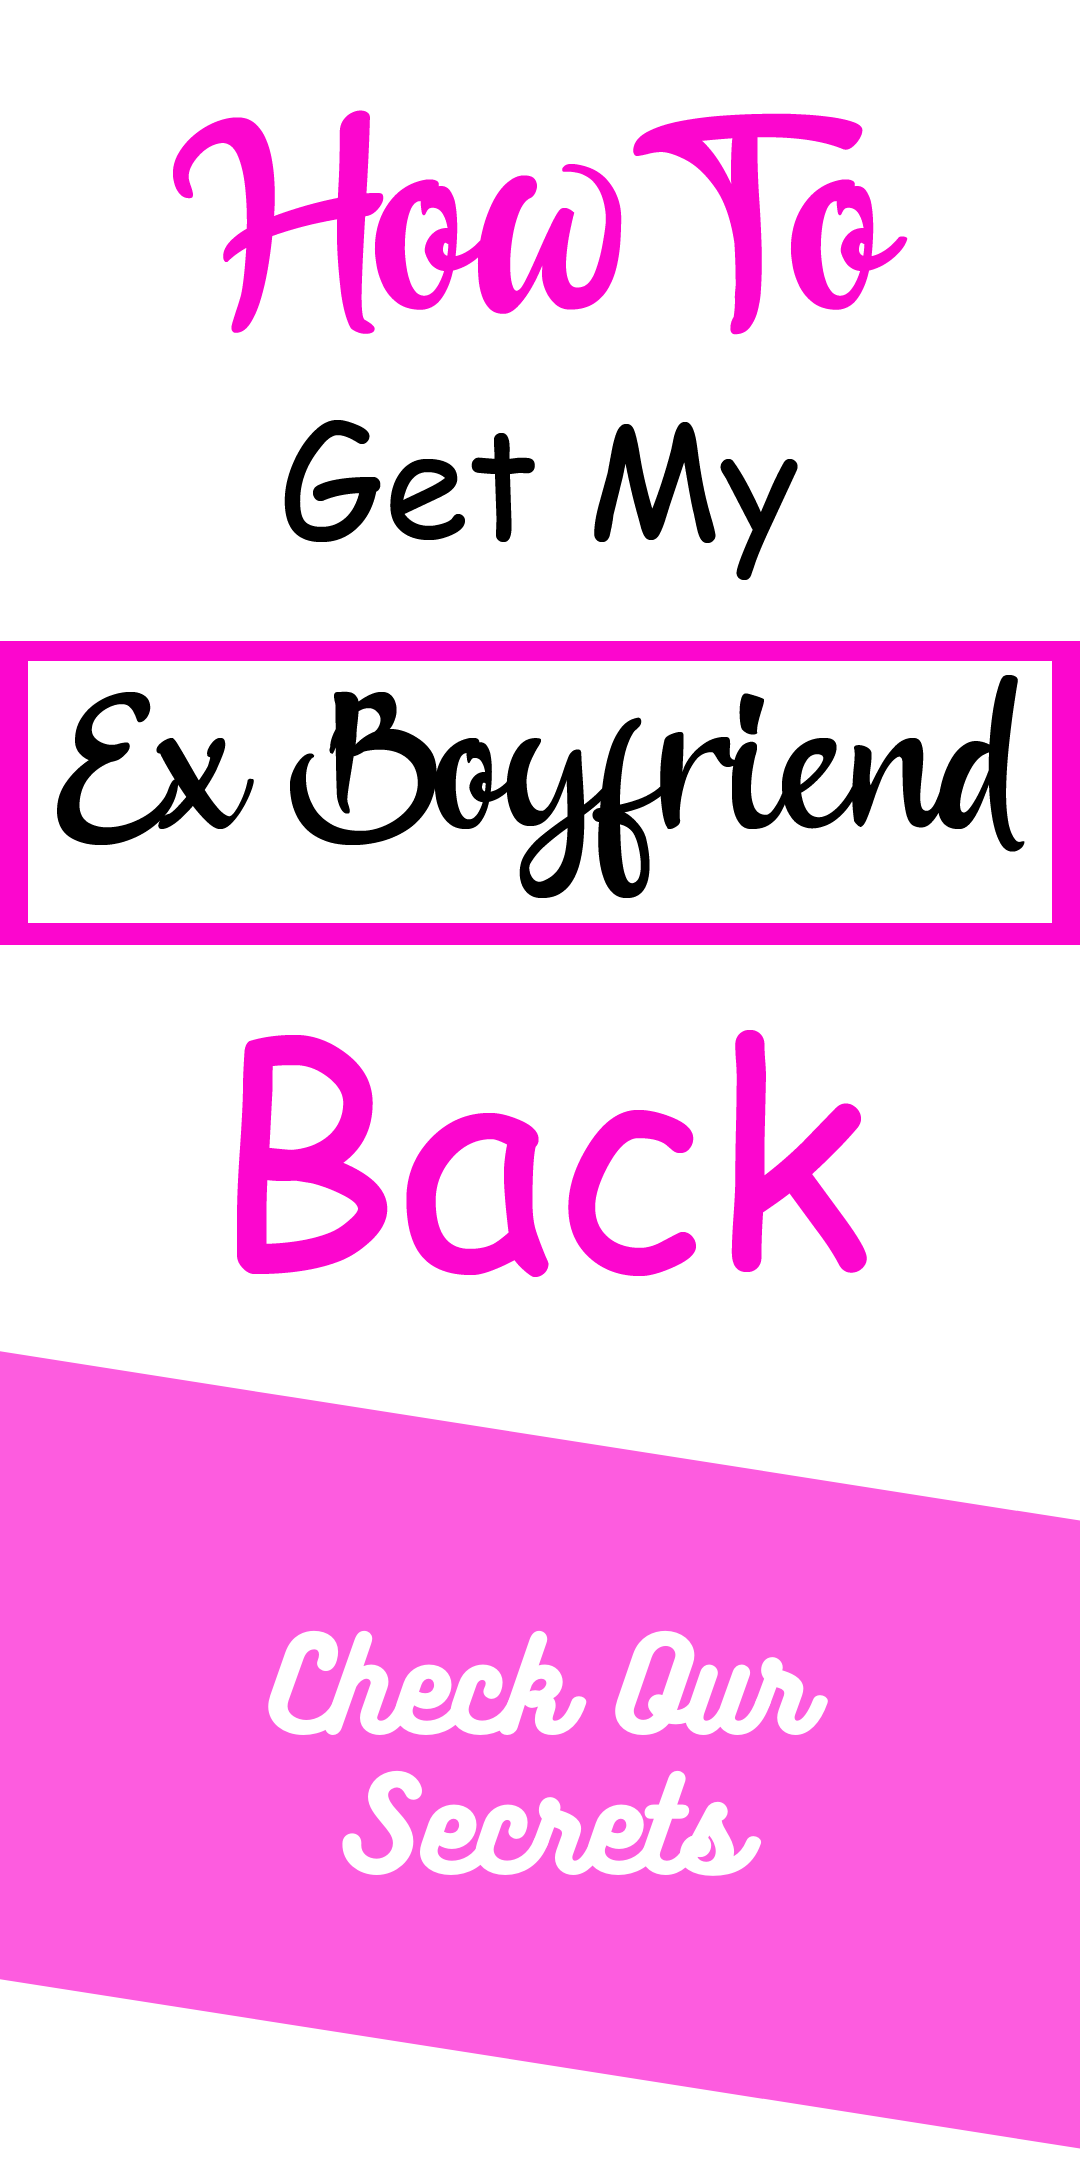 How To Get My Ex Boyfriend Back